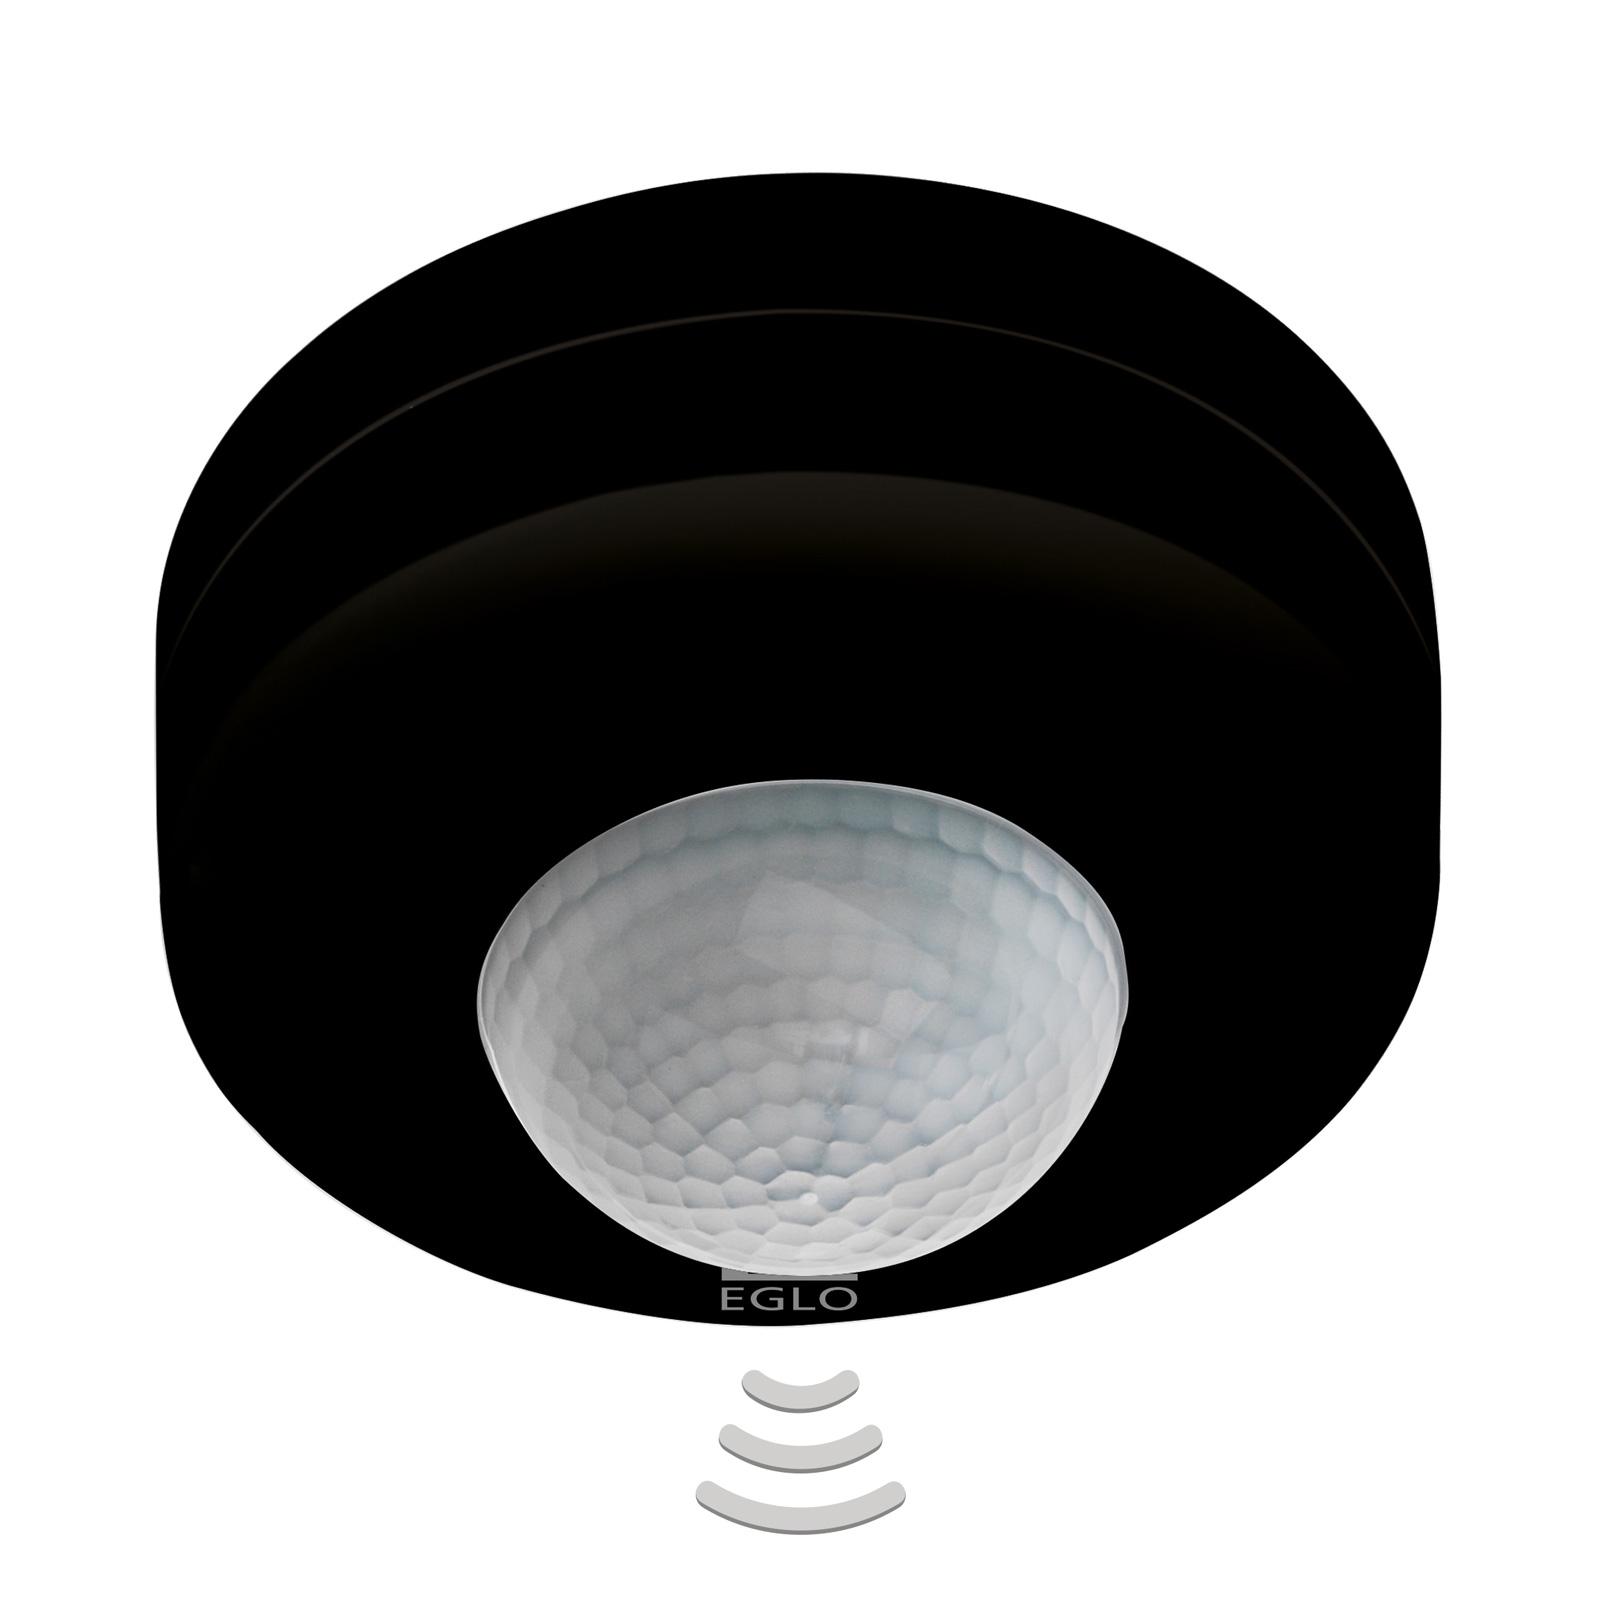 Rörelsesensor Detect Me 6 360° svart